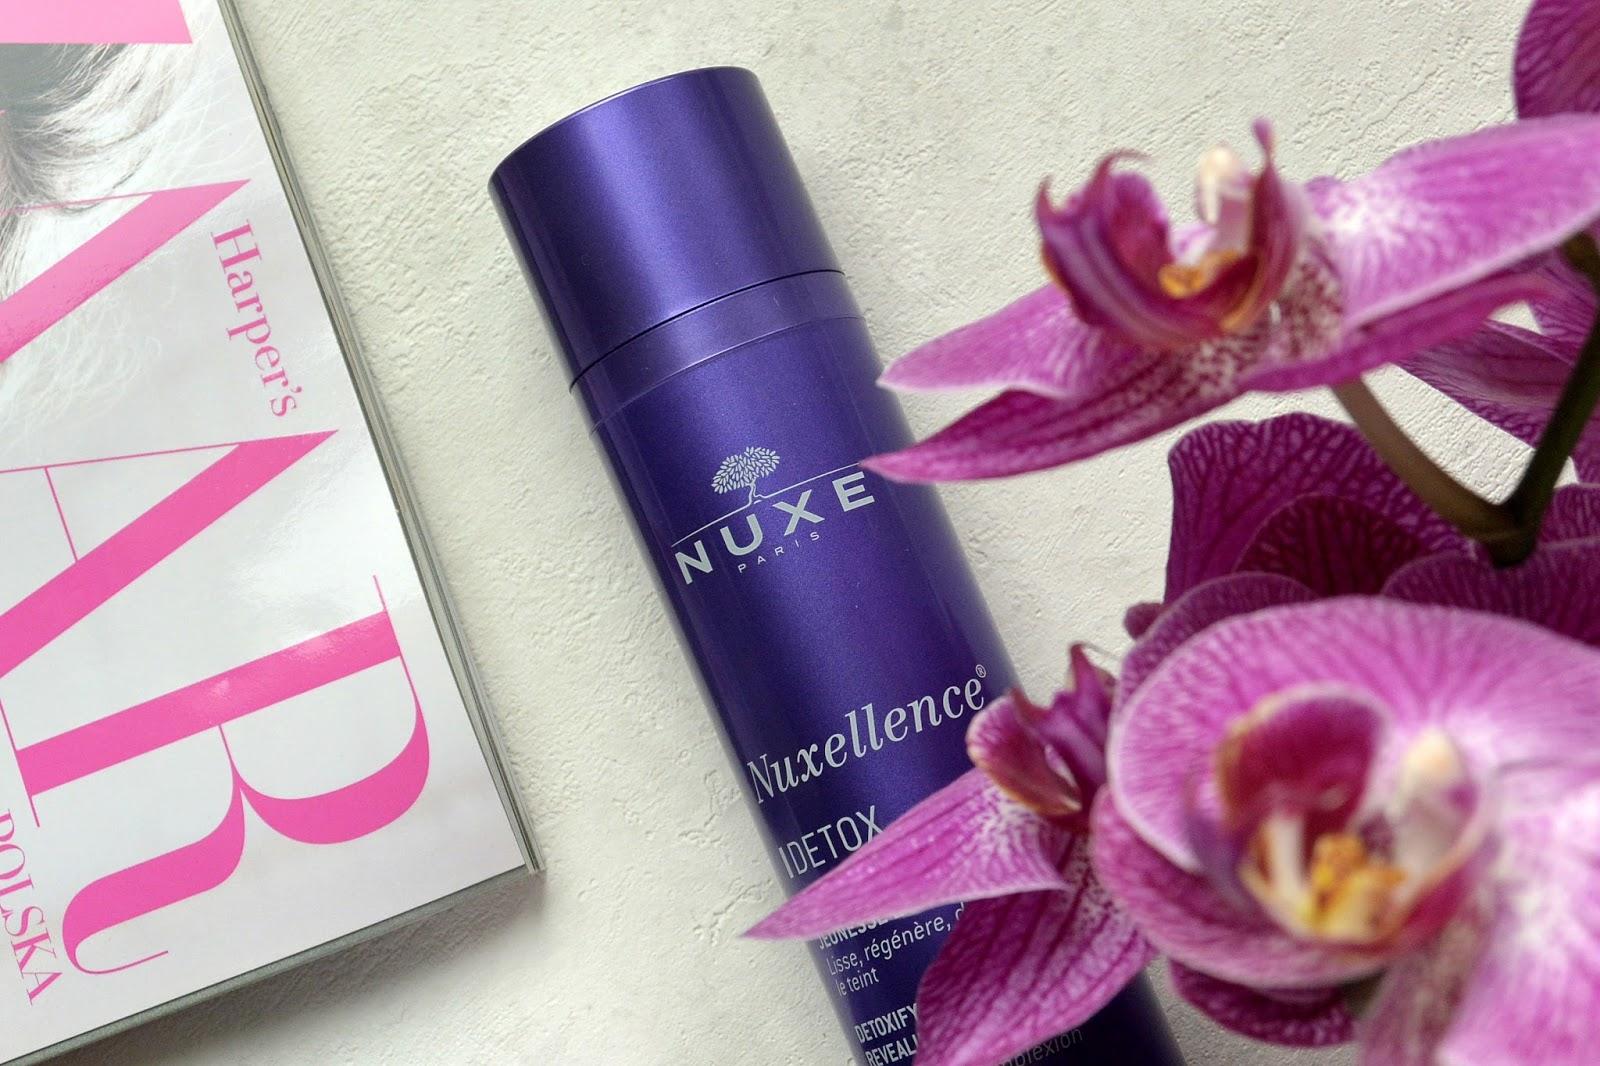 Nocna pielęgnacja skóry | NUXE Nuxellence Detox